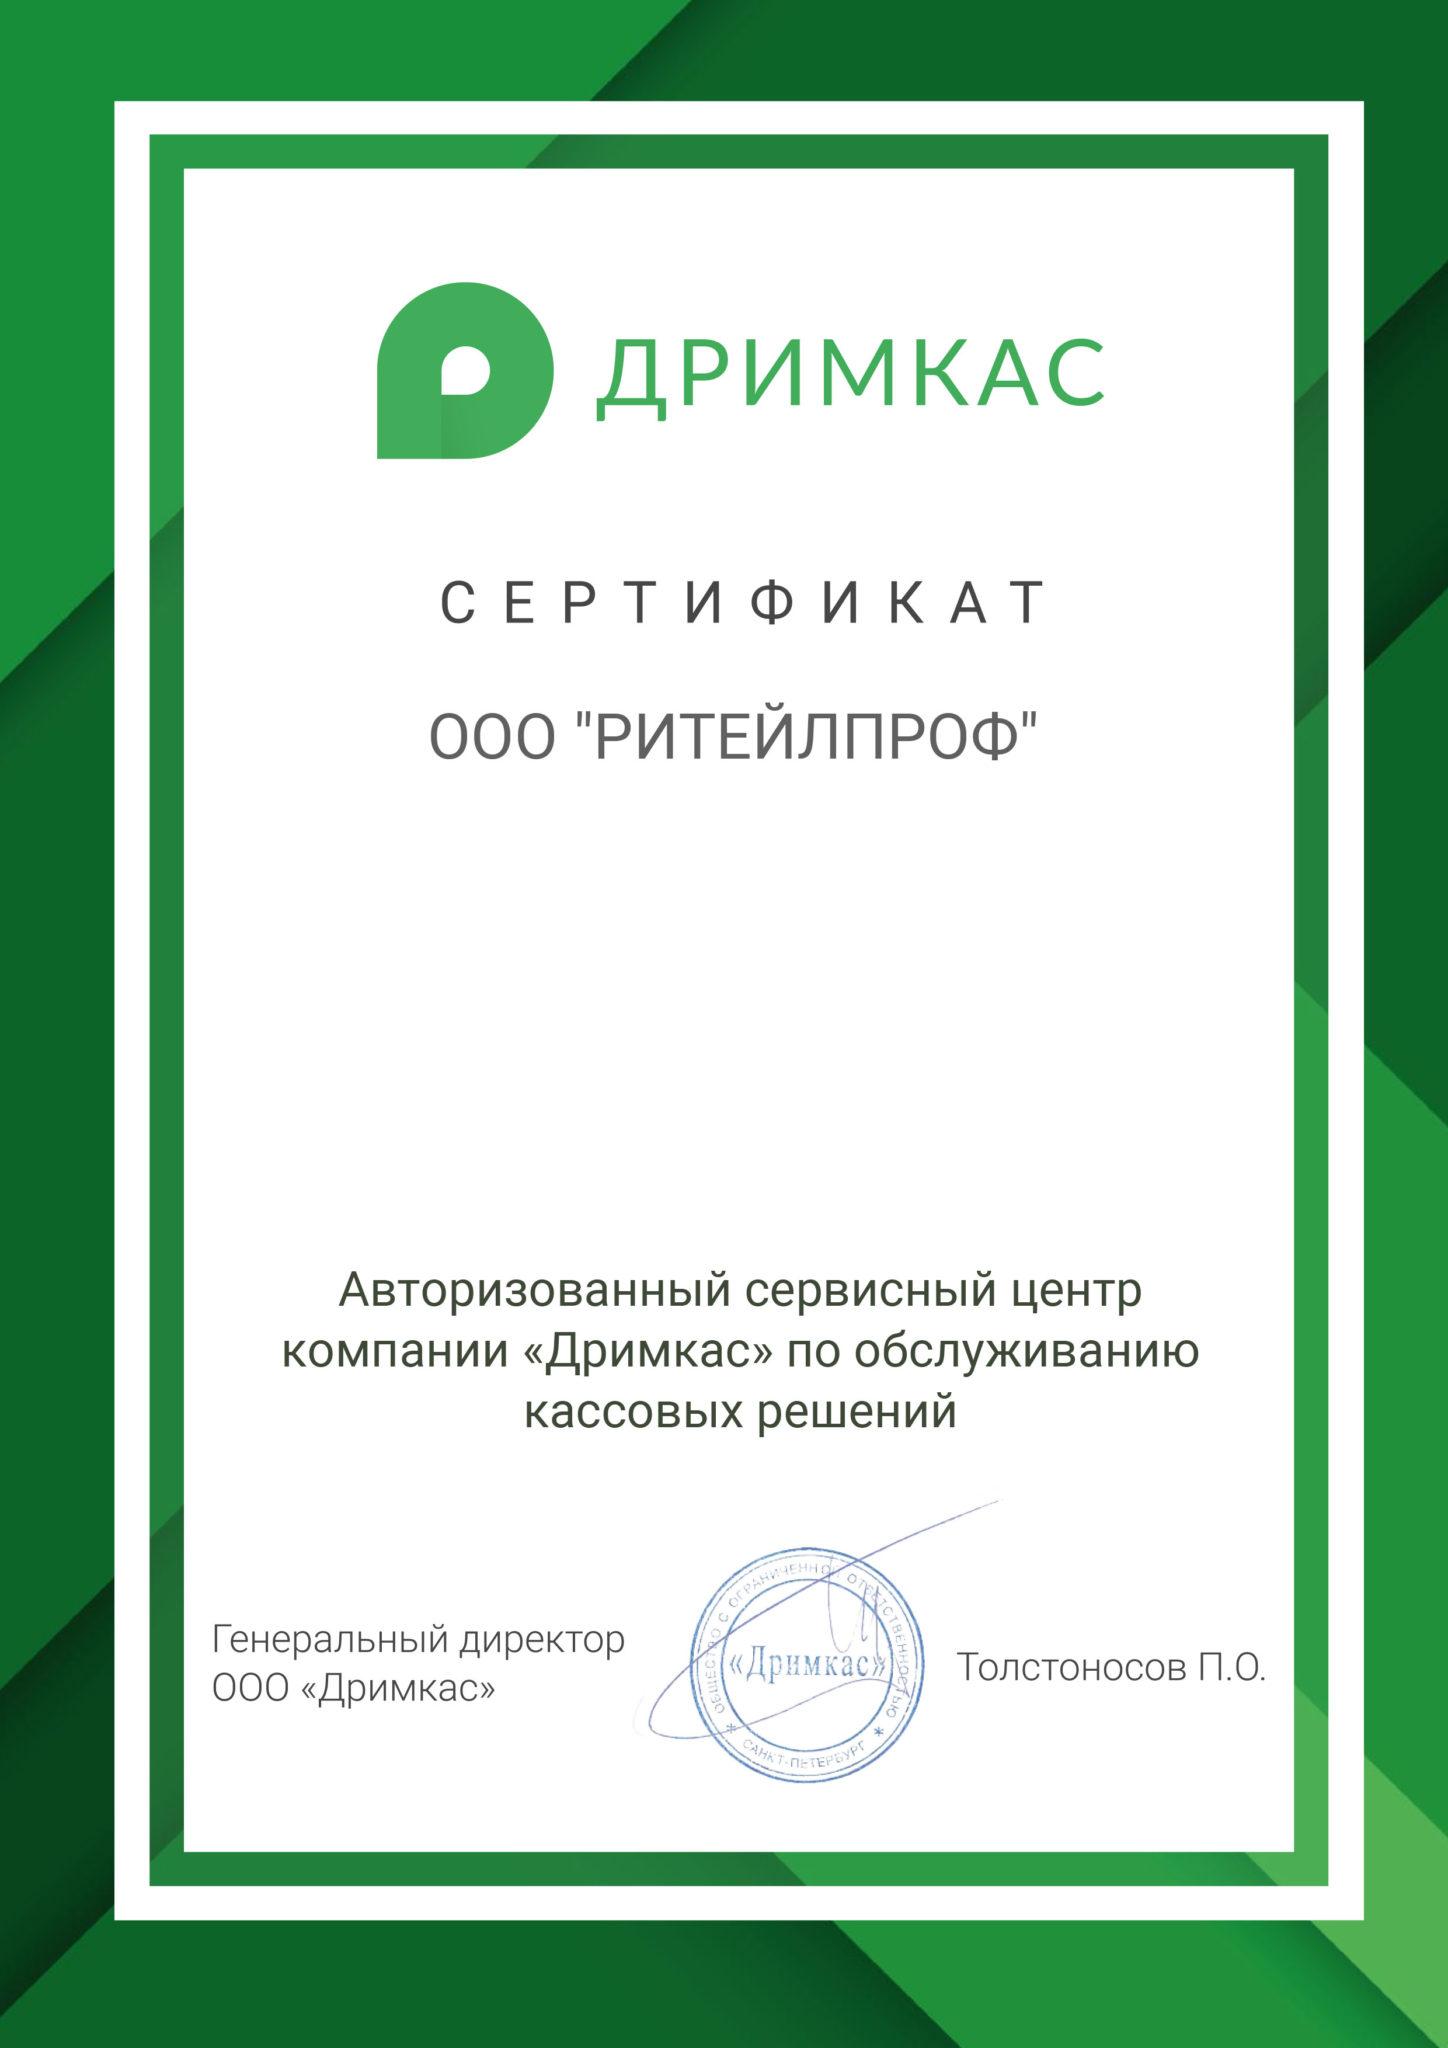 Сертификат АСЦ Дримкас